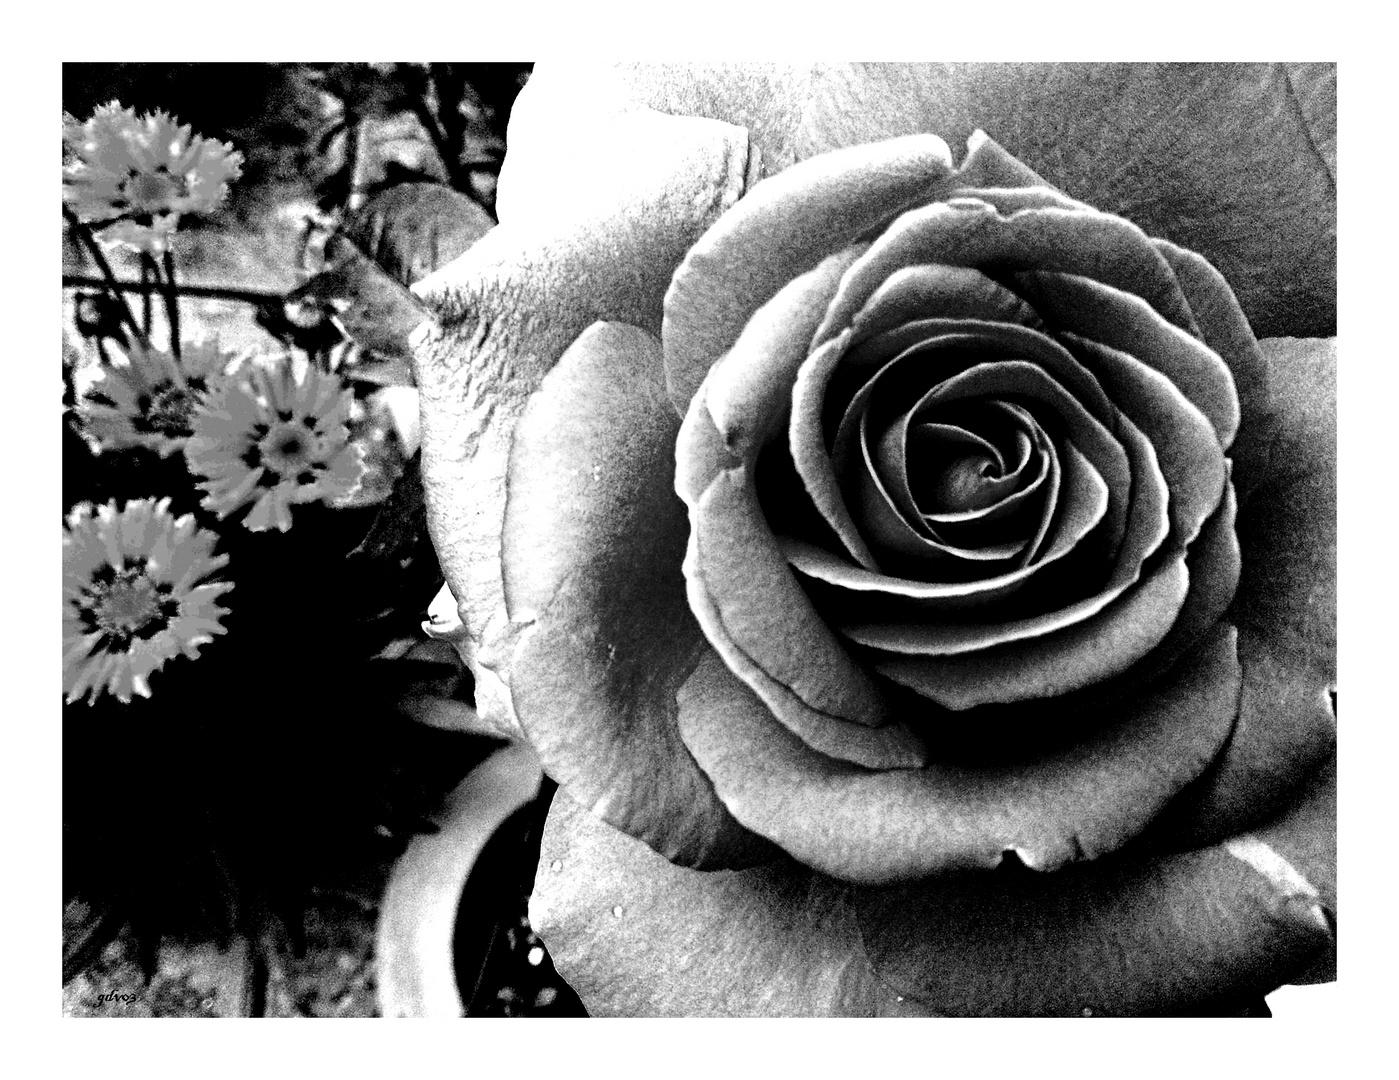 S/w Rose